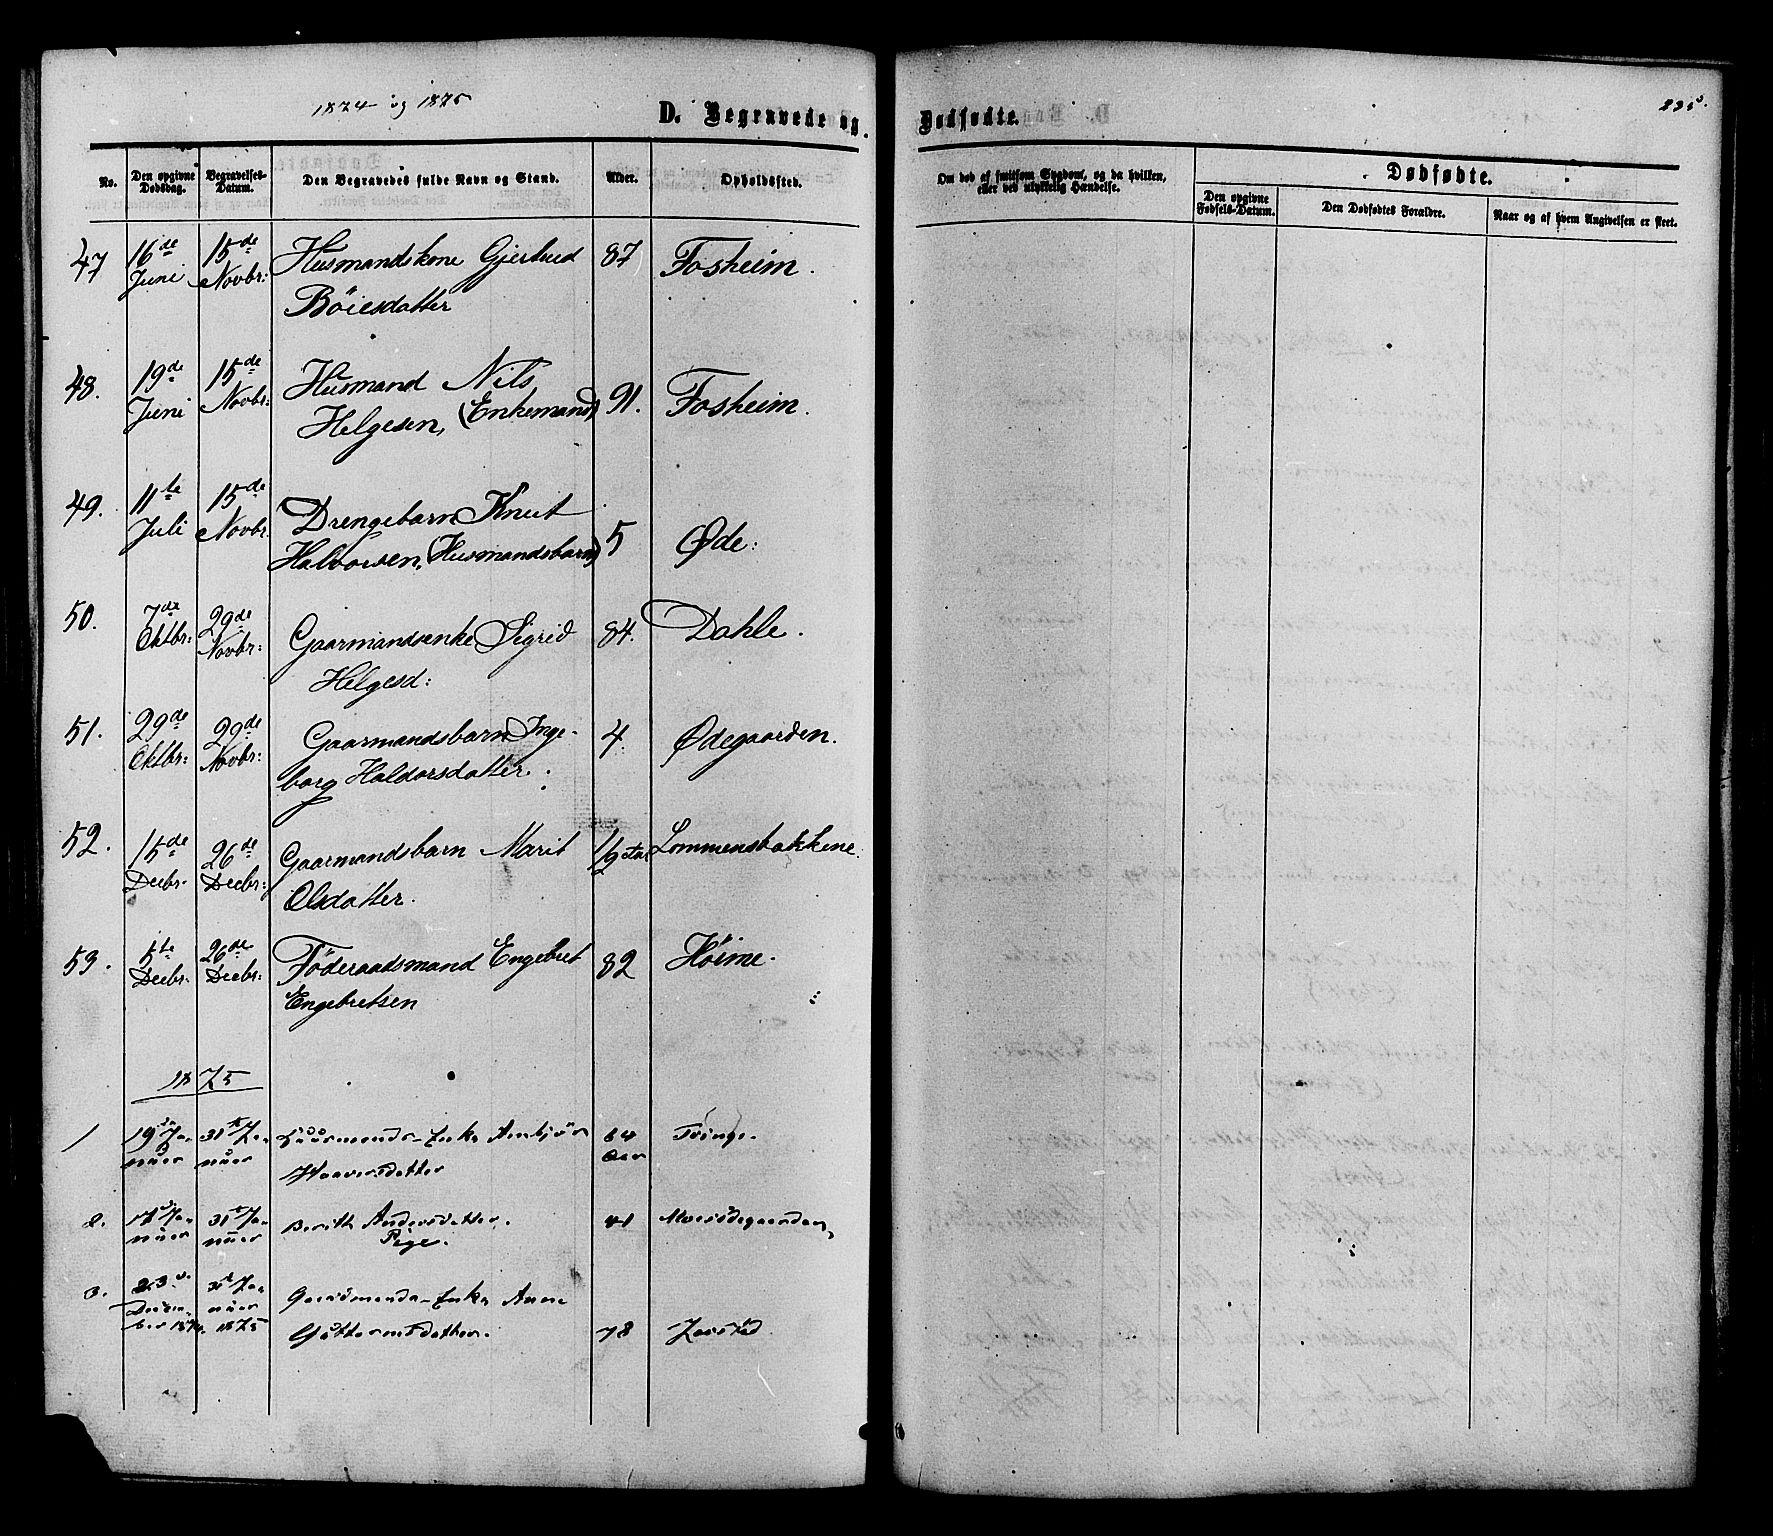 SAH, Vestre Slidre prestekontor, Ministerialbok nr. 3, 1865-1880, s. 235